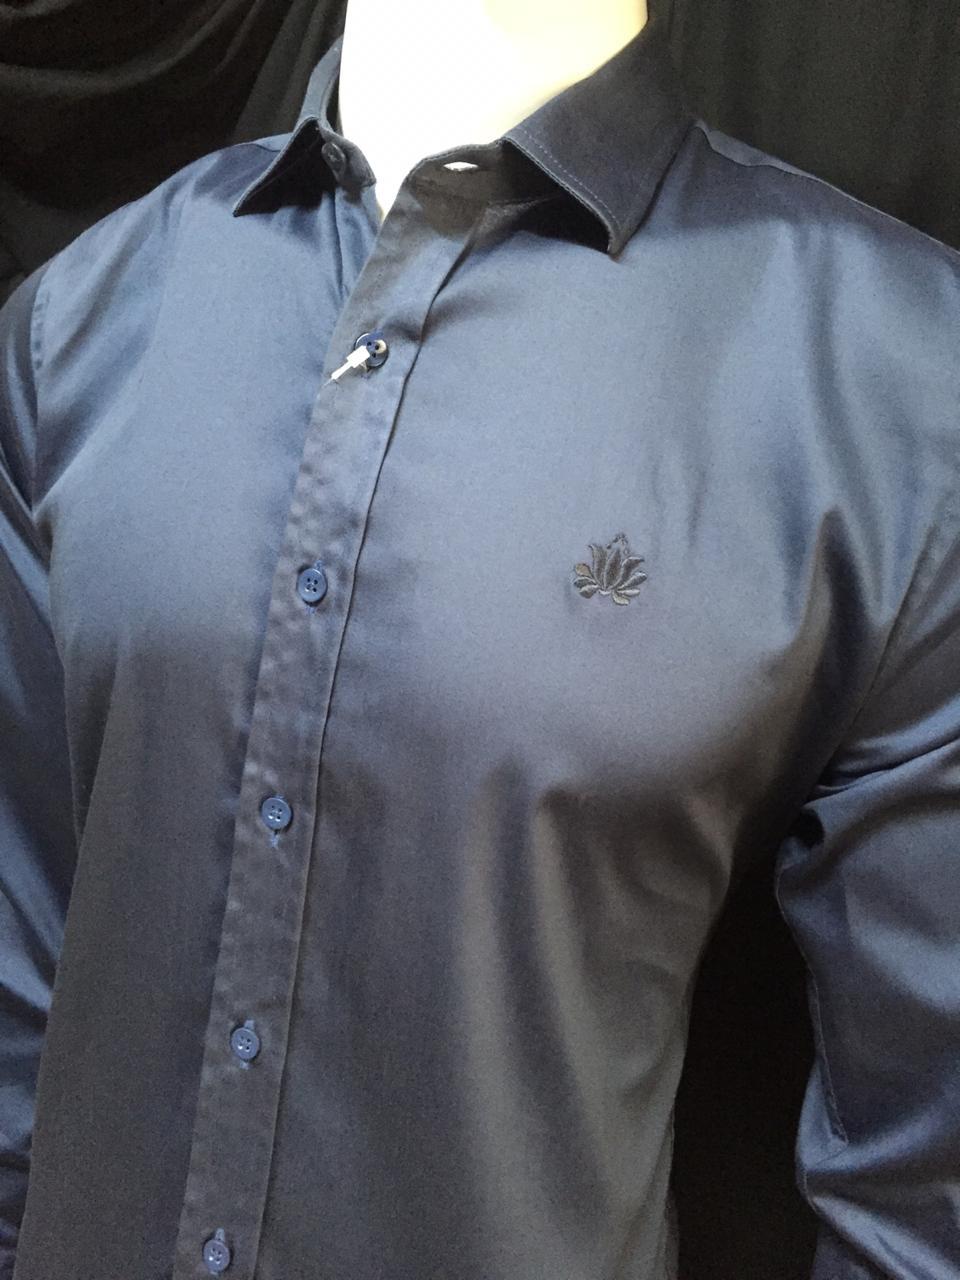 Camisa Masculina LandsCapes Manga Longa Algodão Lisa - Azul